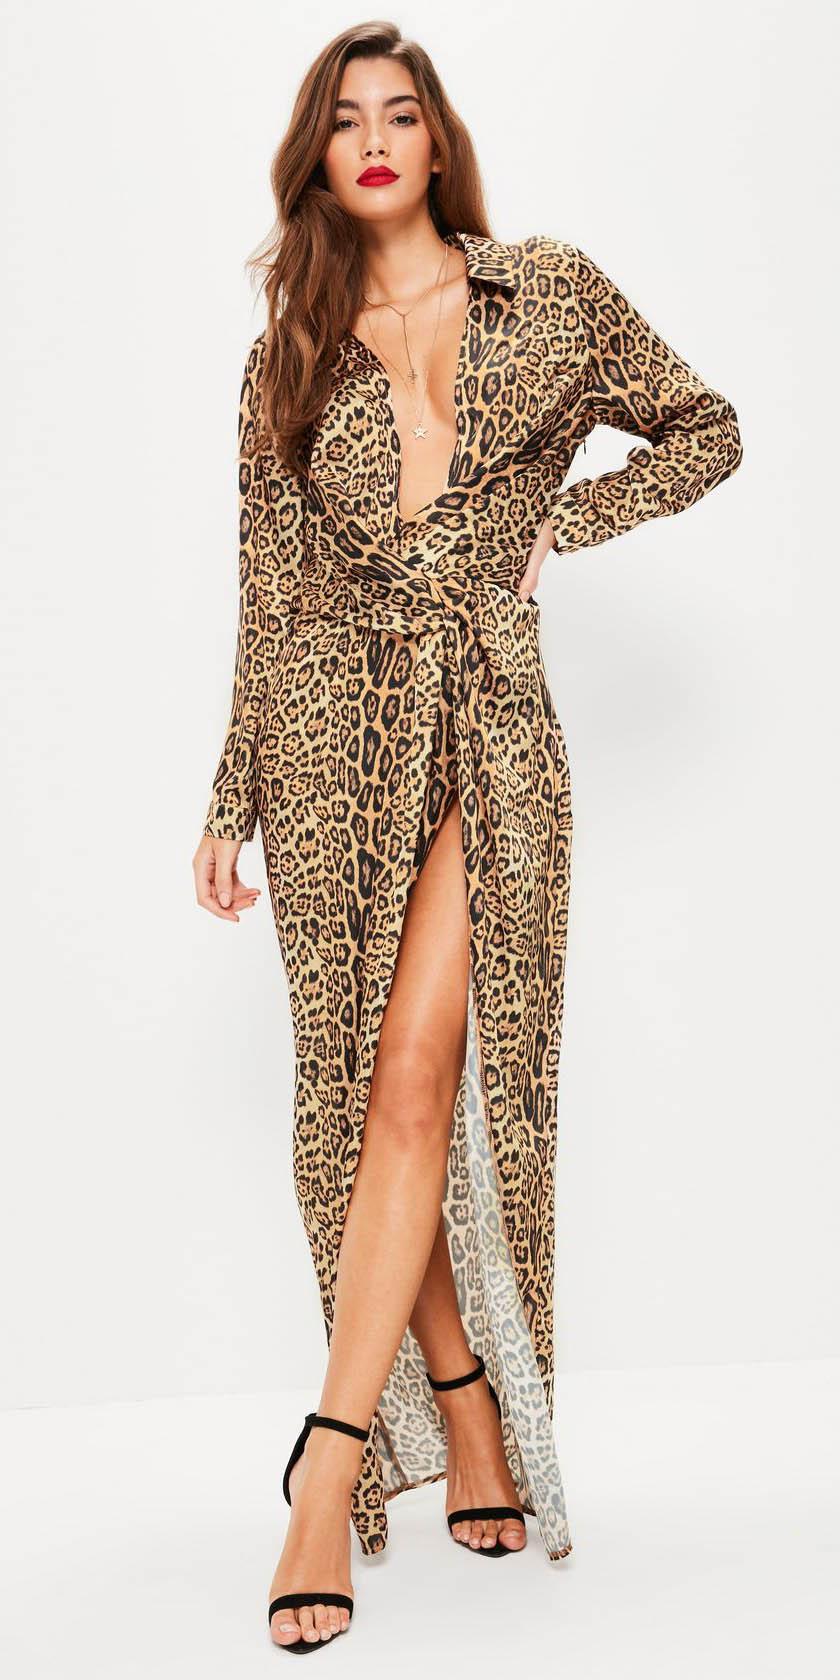 tan-dress-maxi-leopard-print-wrap-necklace-black-shoe-sandalh-spring-summer-hairr-dinner.jpg